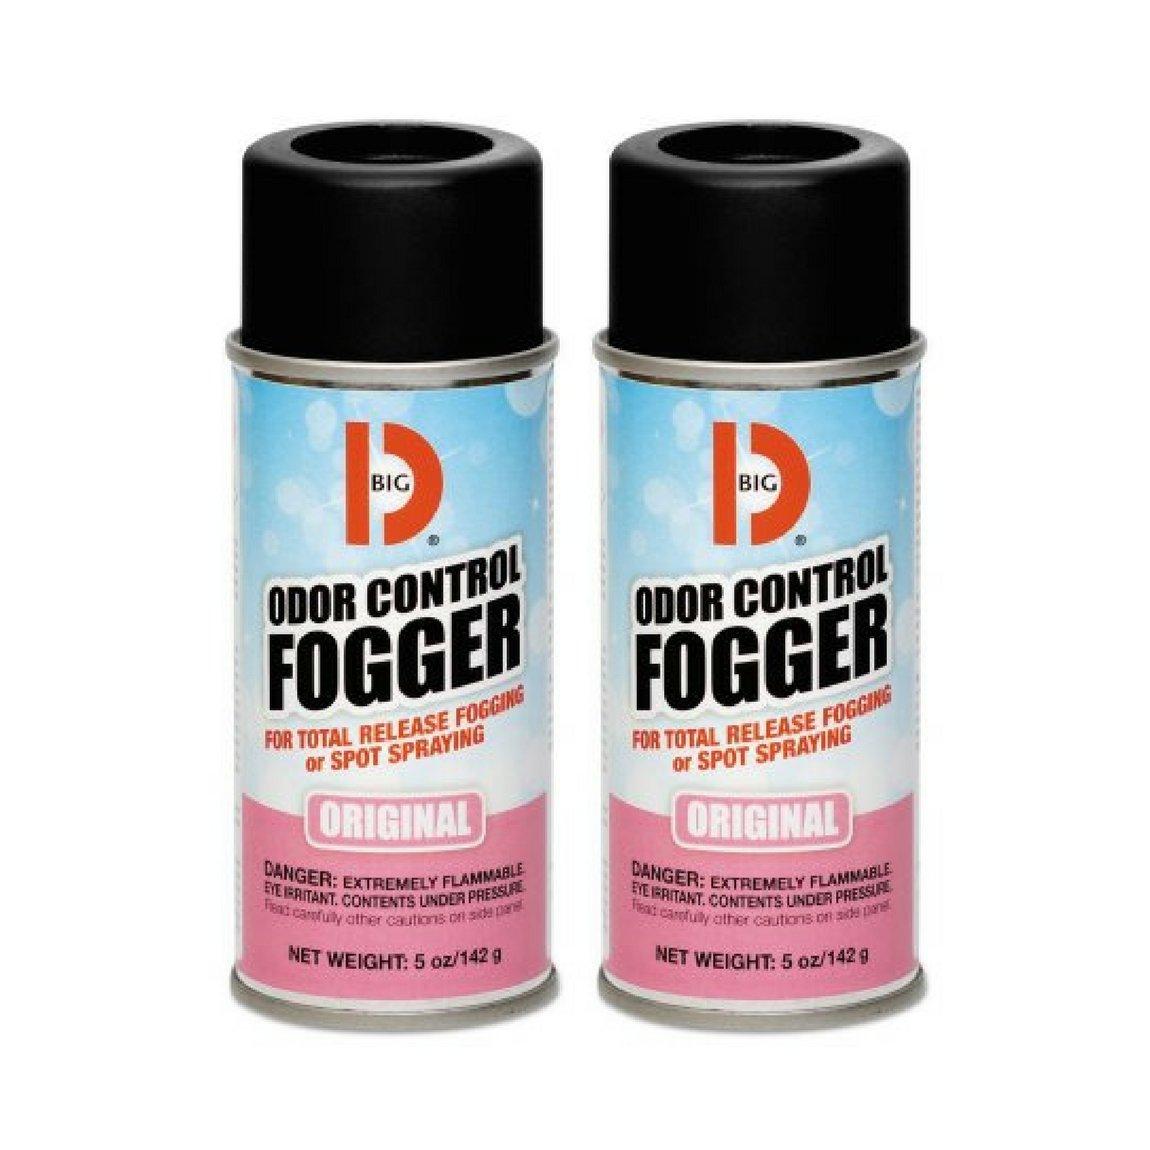 Big D 341 Odor Control Fogger, Original Fragrance, 5 oz (Pack of 12) - Kills odors from fire, flood, decomposition, skunk, cigarettes,musty smells - Ideal for use in cars,management , hotels - 2 Packs